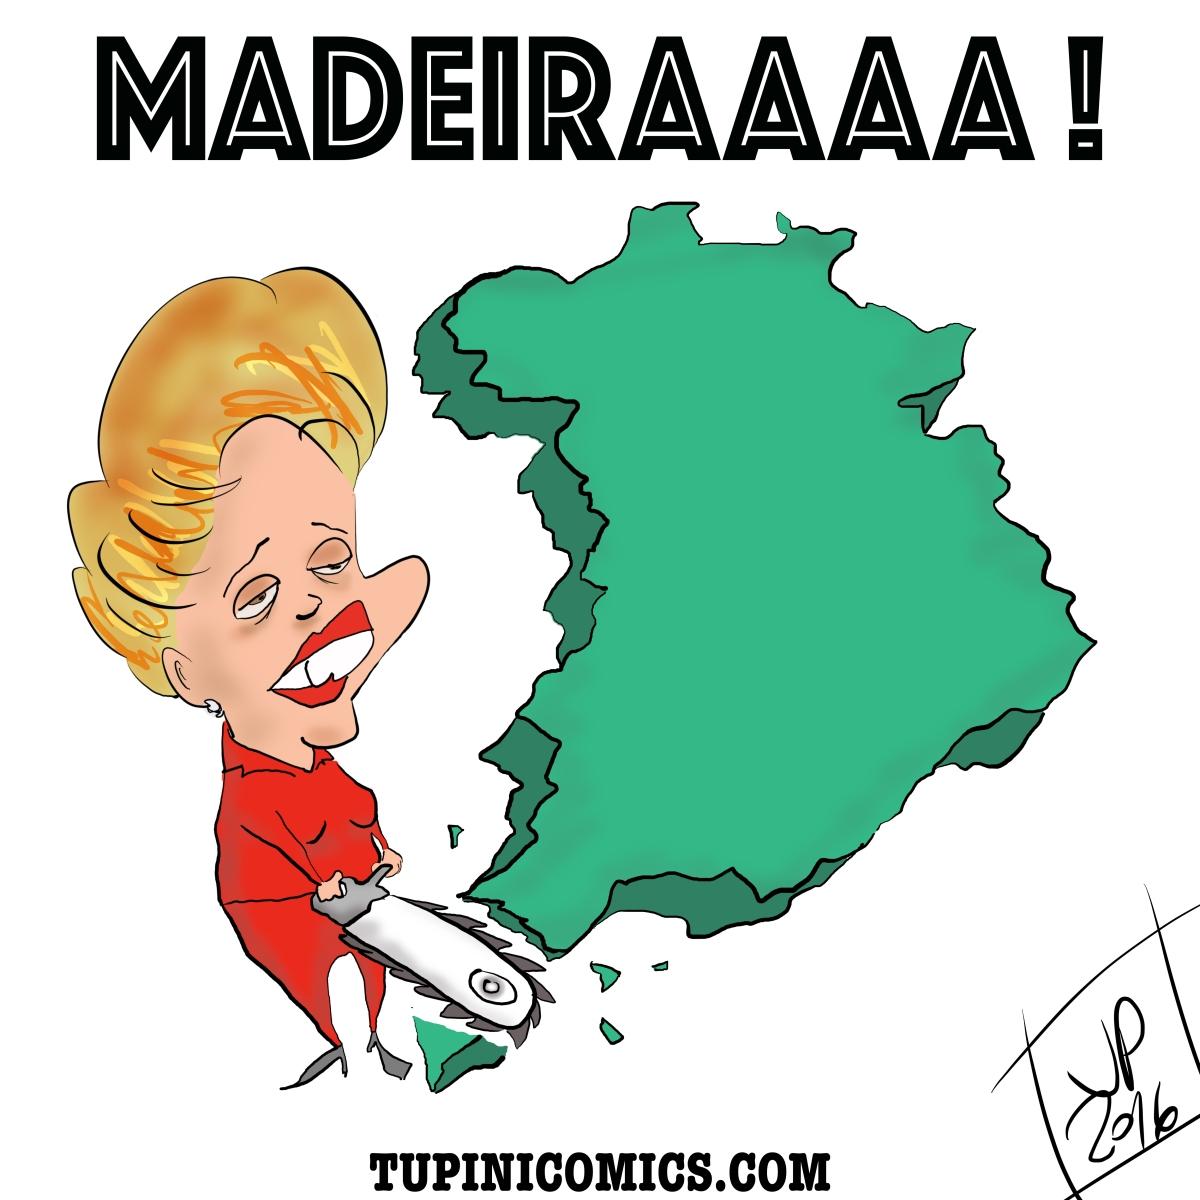 Madeira !